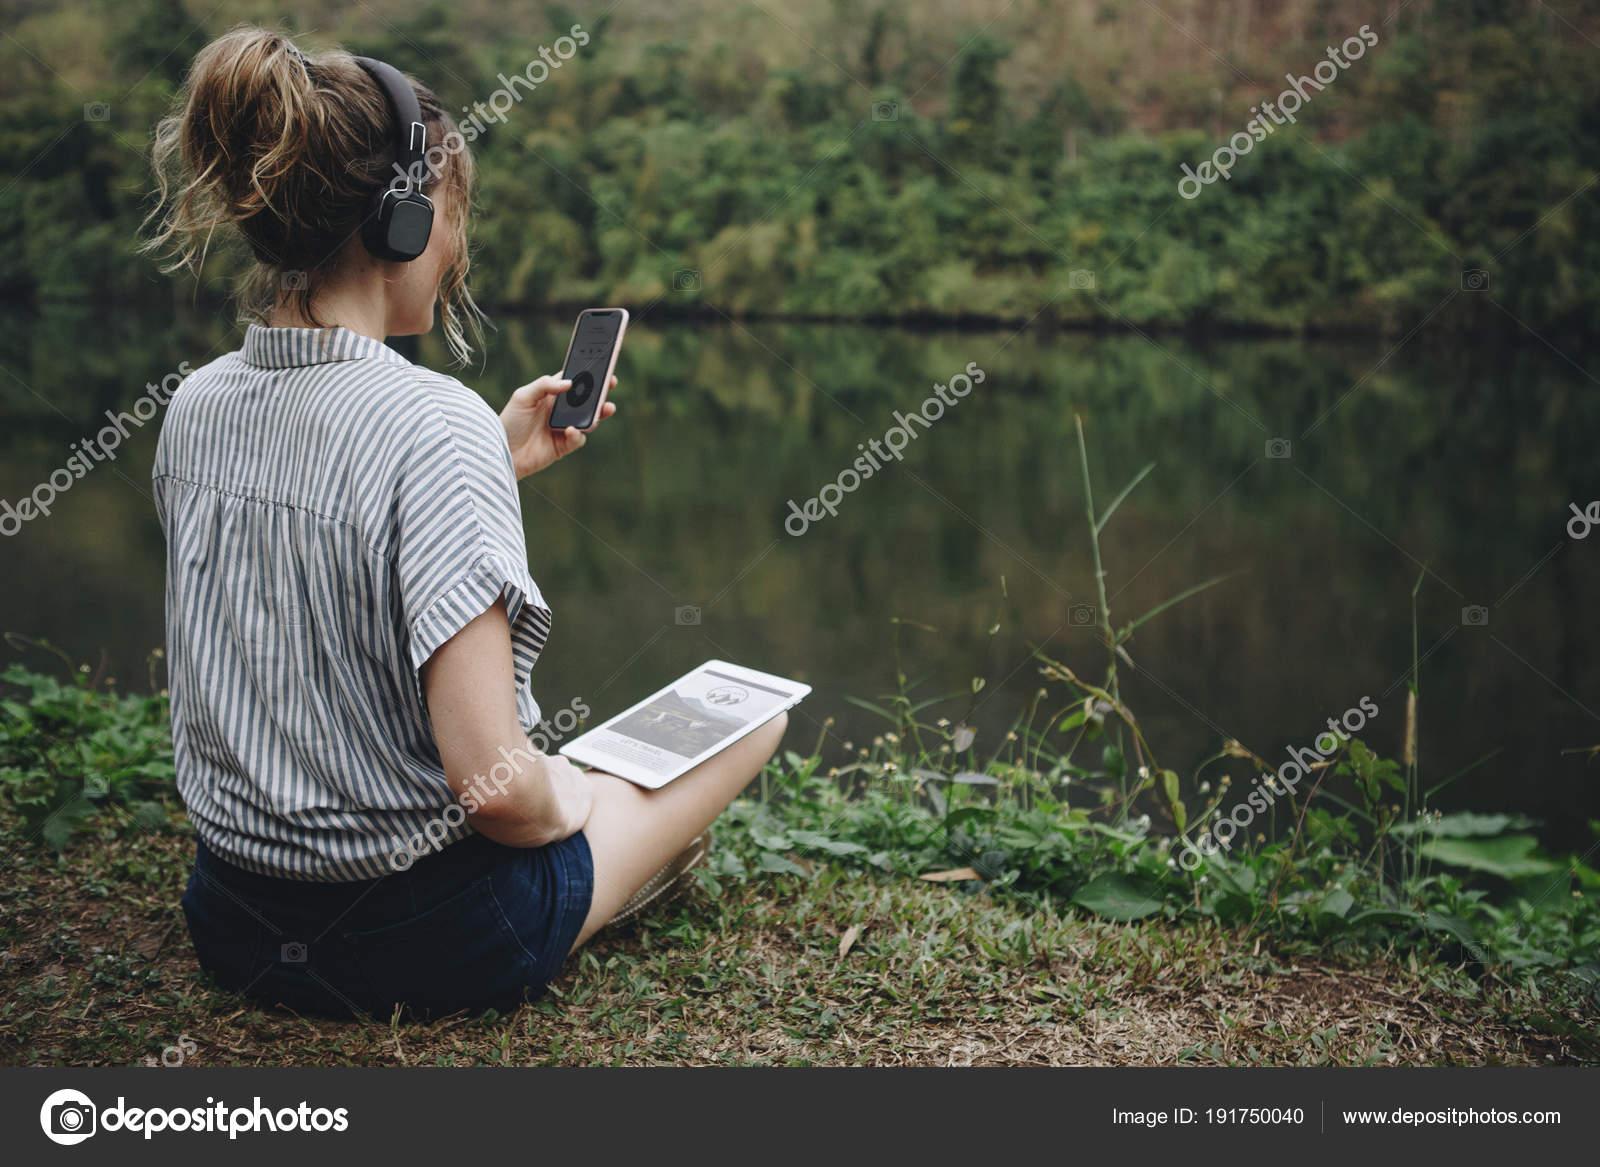 Woman alone nature listening music headphones digital tablet smartphone music stock photo